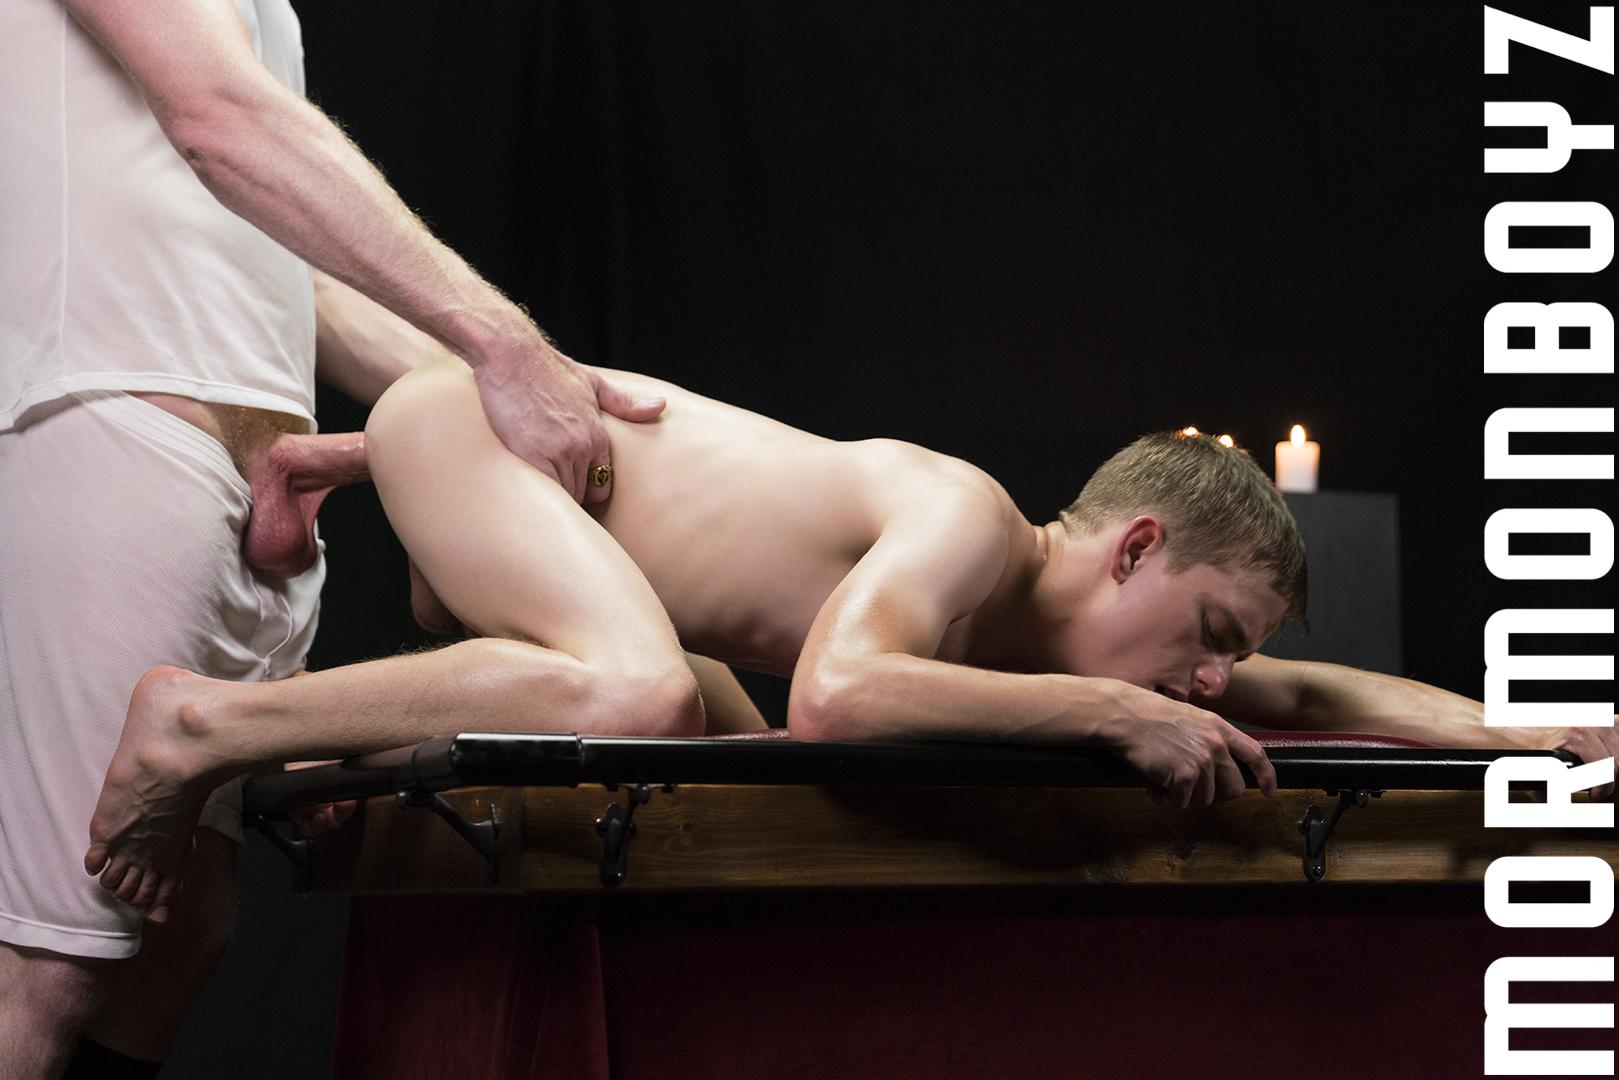 170820_mbz_07-mormonboyz-gay-daddy-son-sex_pic24